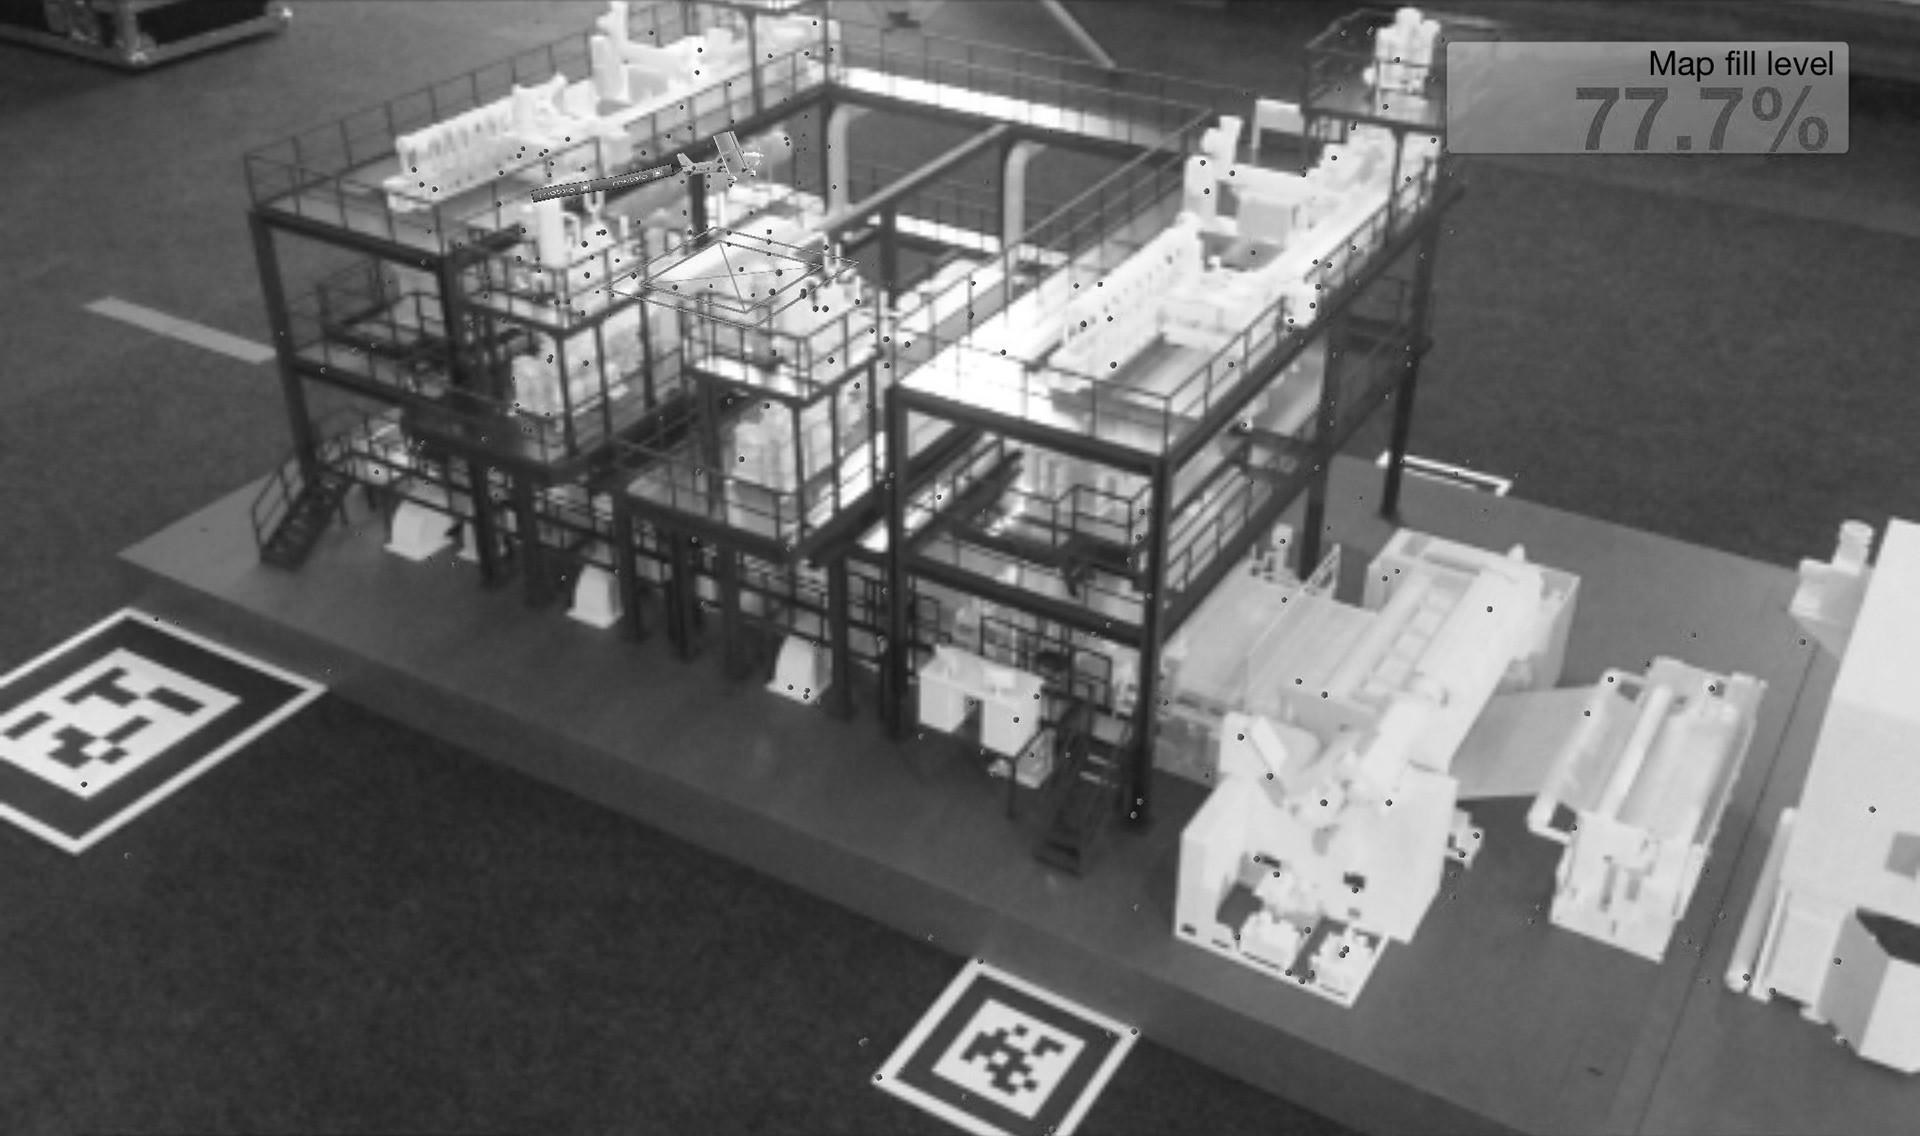 NEOANALOG Reifenhäuser Augmented Industry